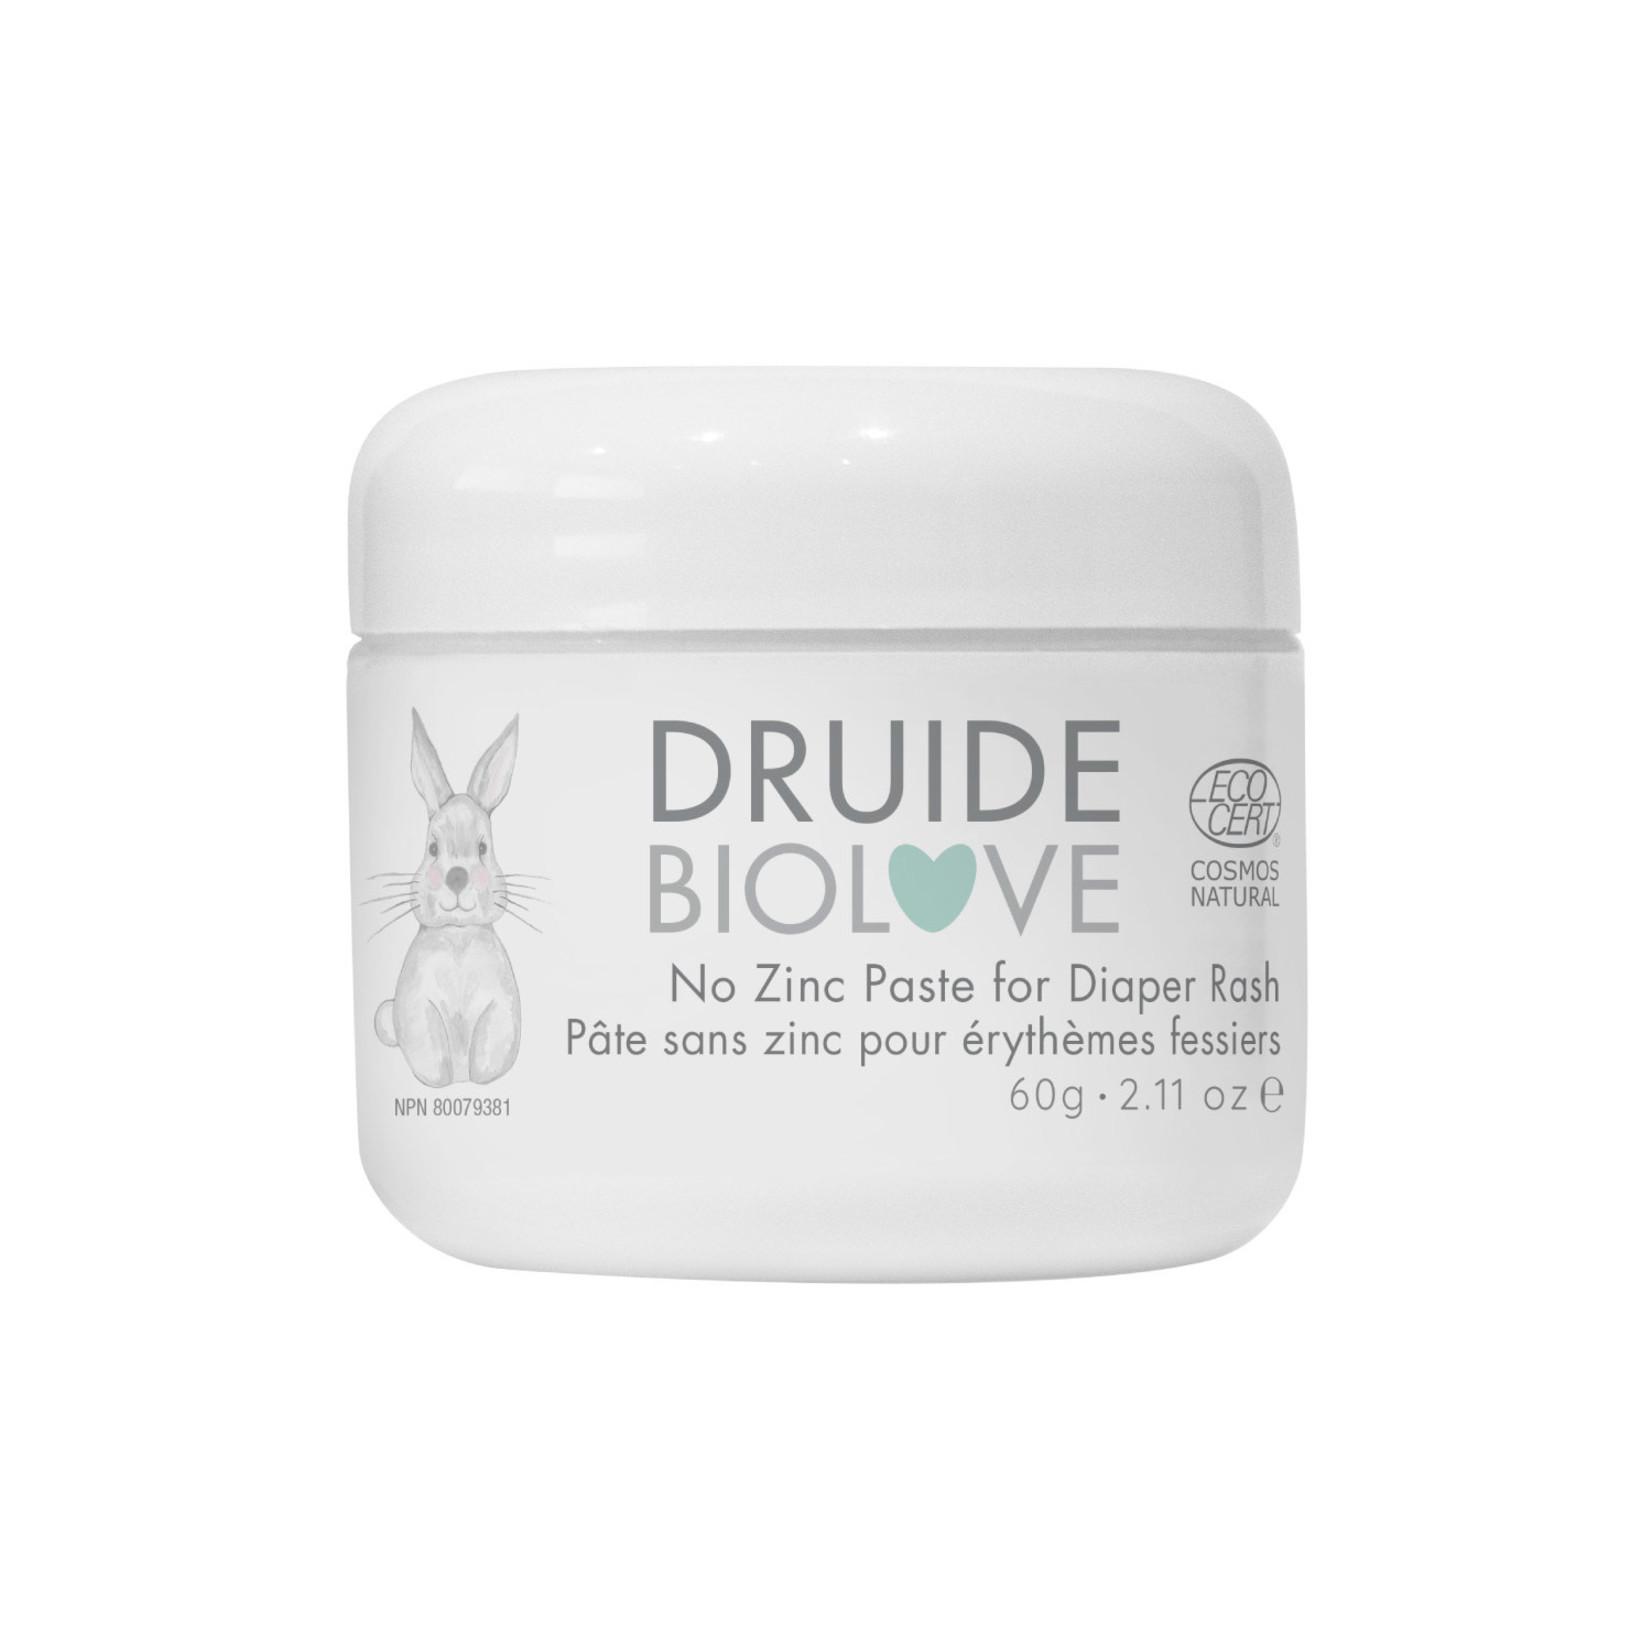 Druide Druide Biolove Diaper Rash Paste